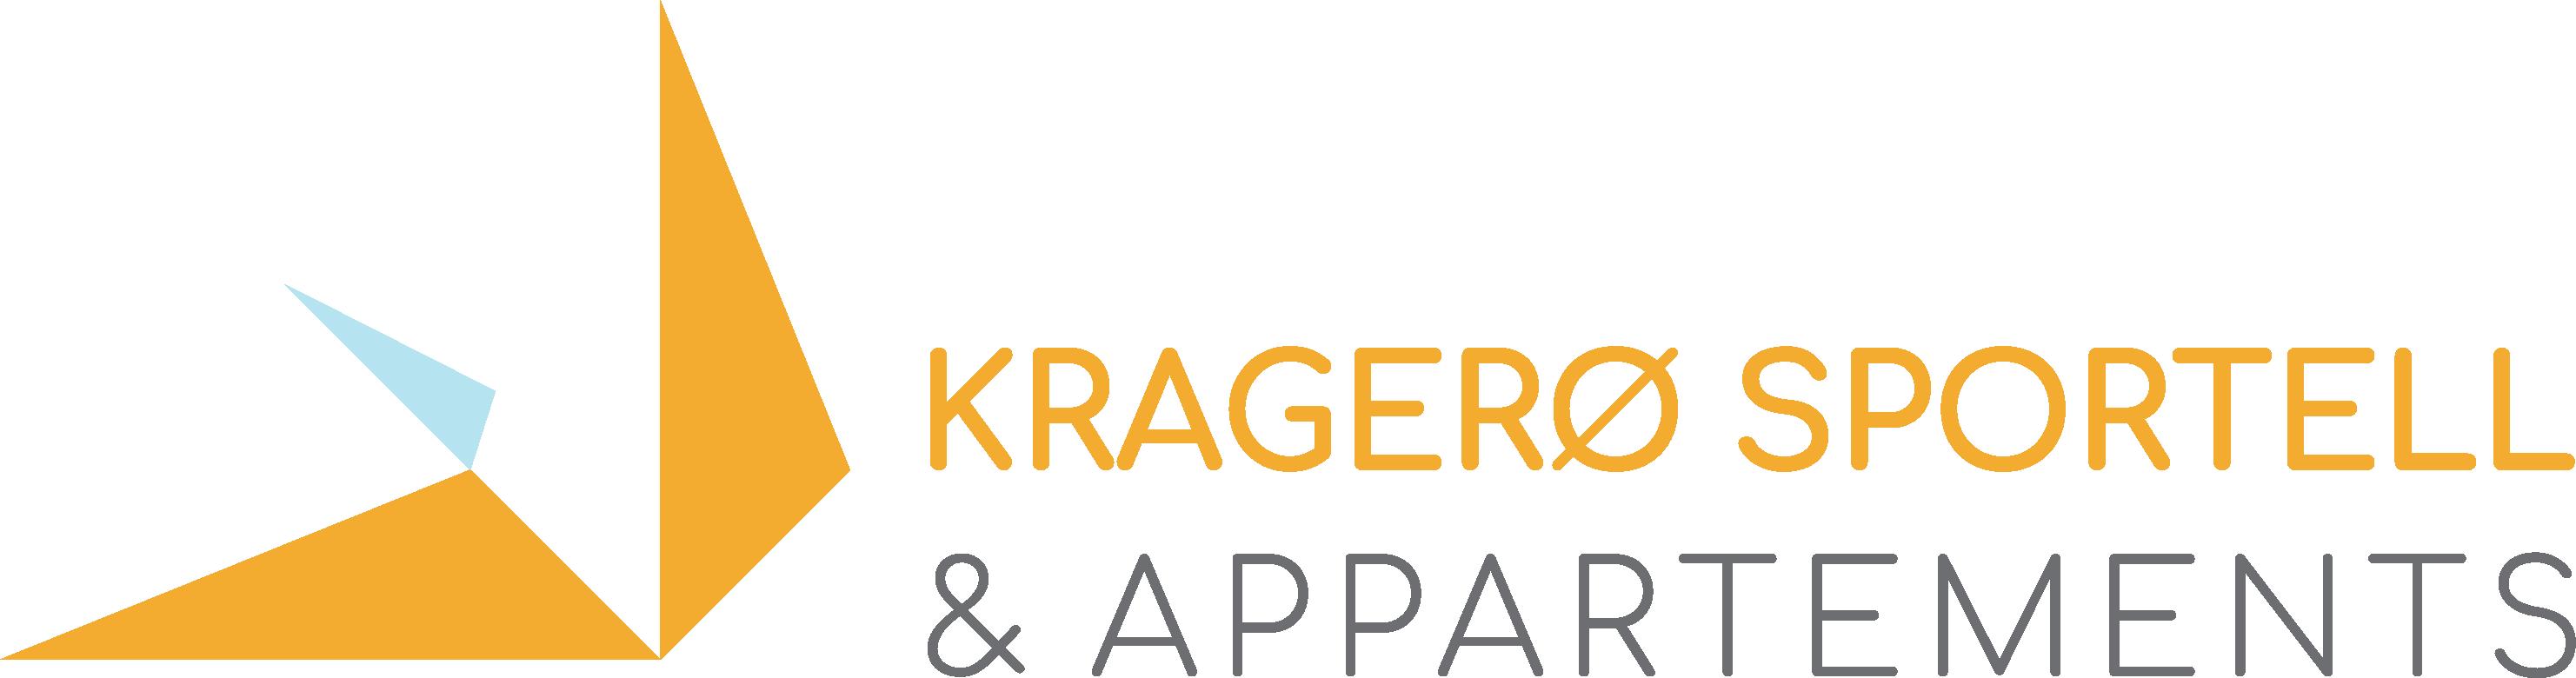 Kragerø Sportell & Appartments